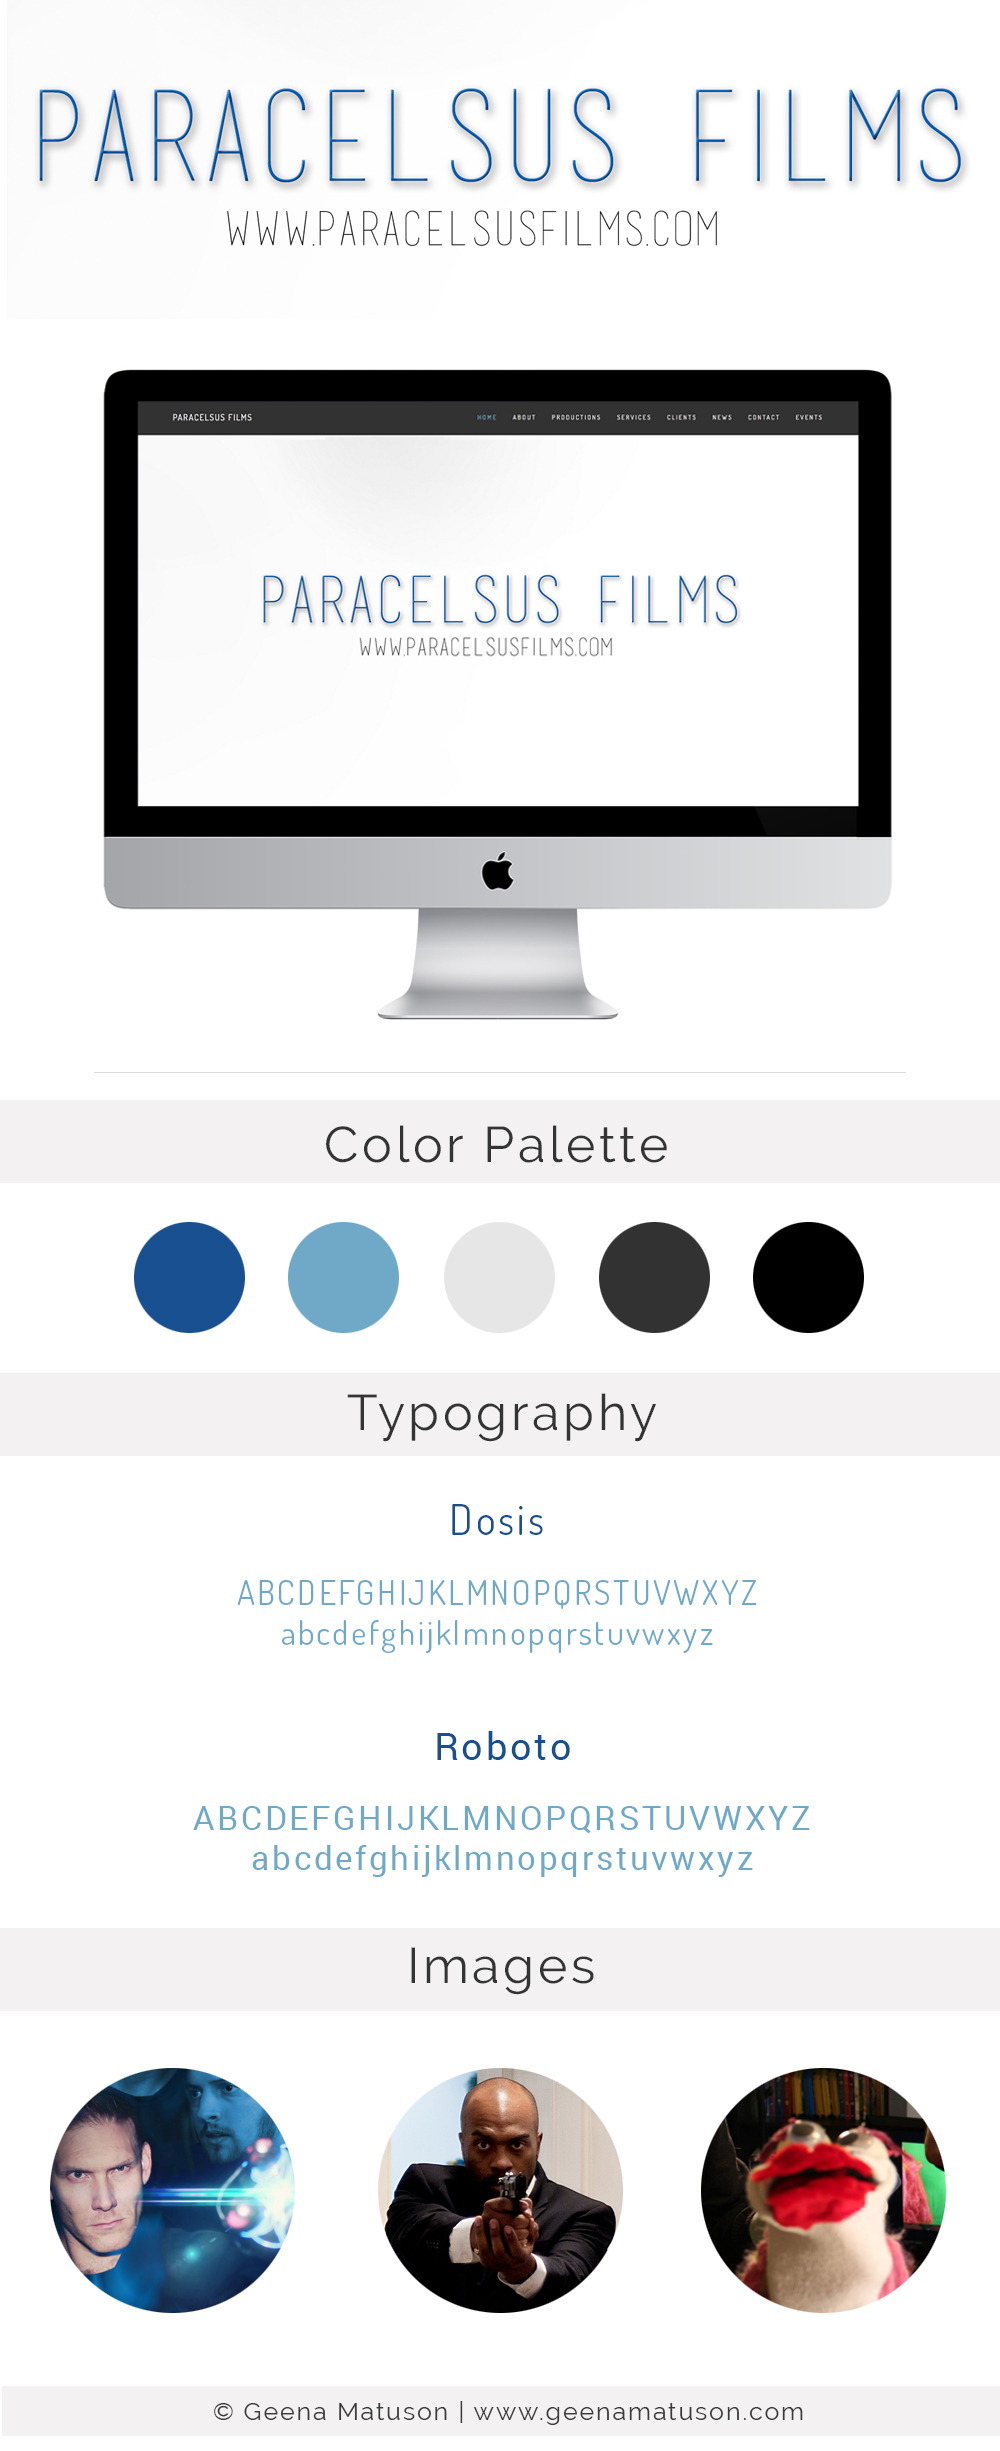 GeenaMatuson_Design_Elements_ParacelsusFilms.jpg